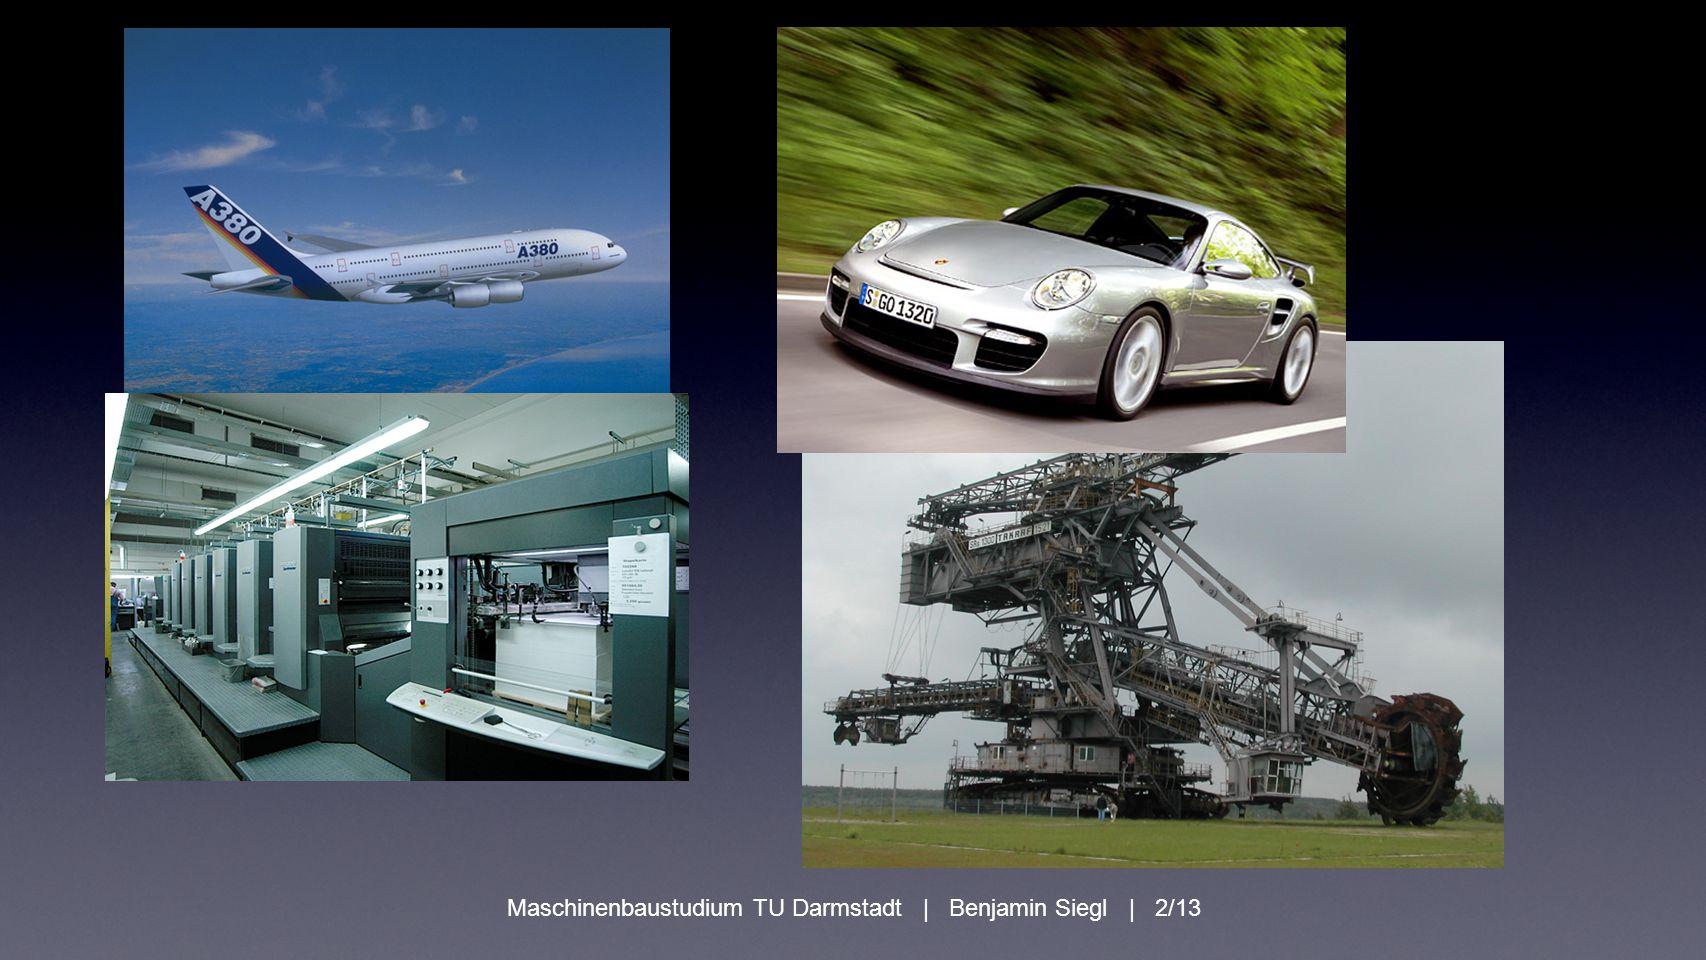 Maschinenbaustudium TU Darmstadt | Benjamin Siegl | 2/13